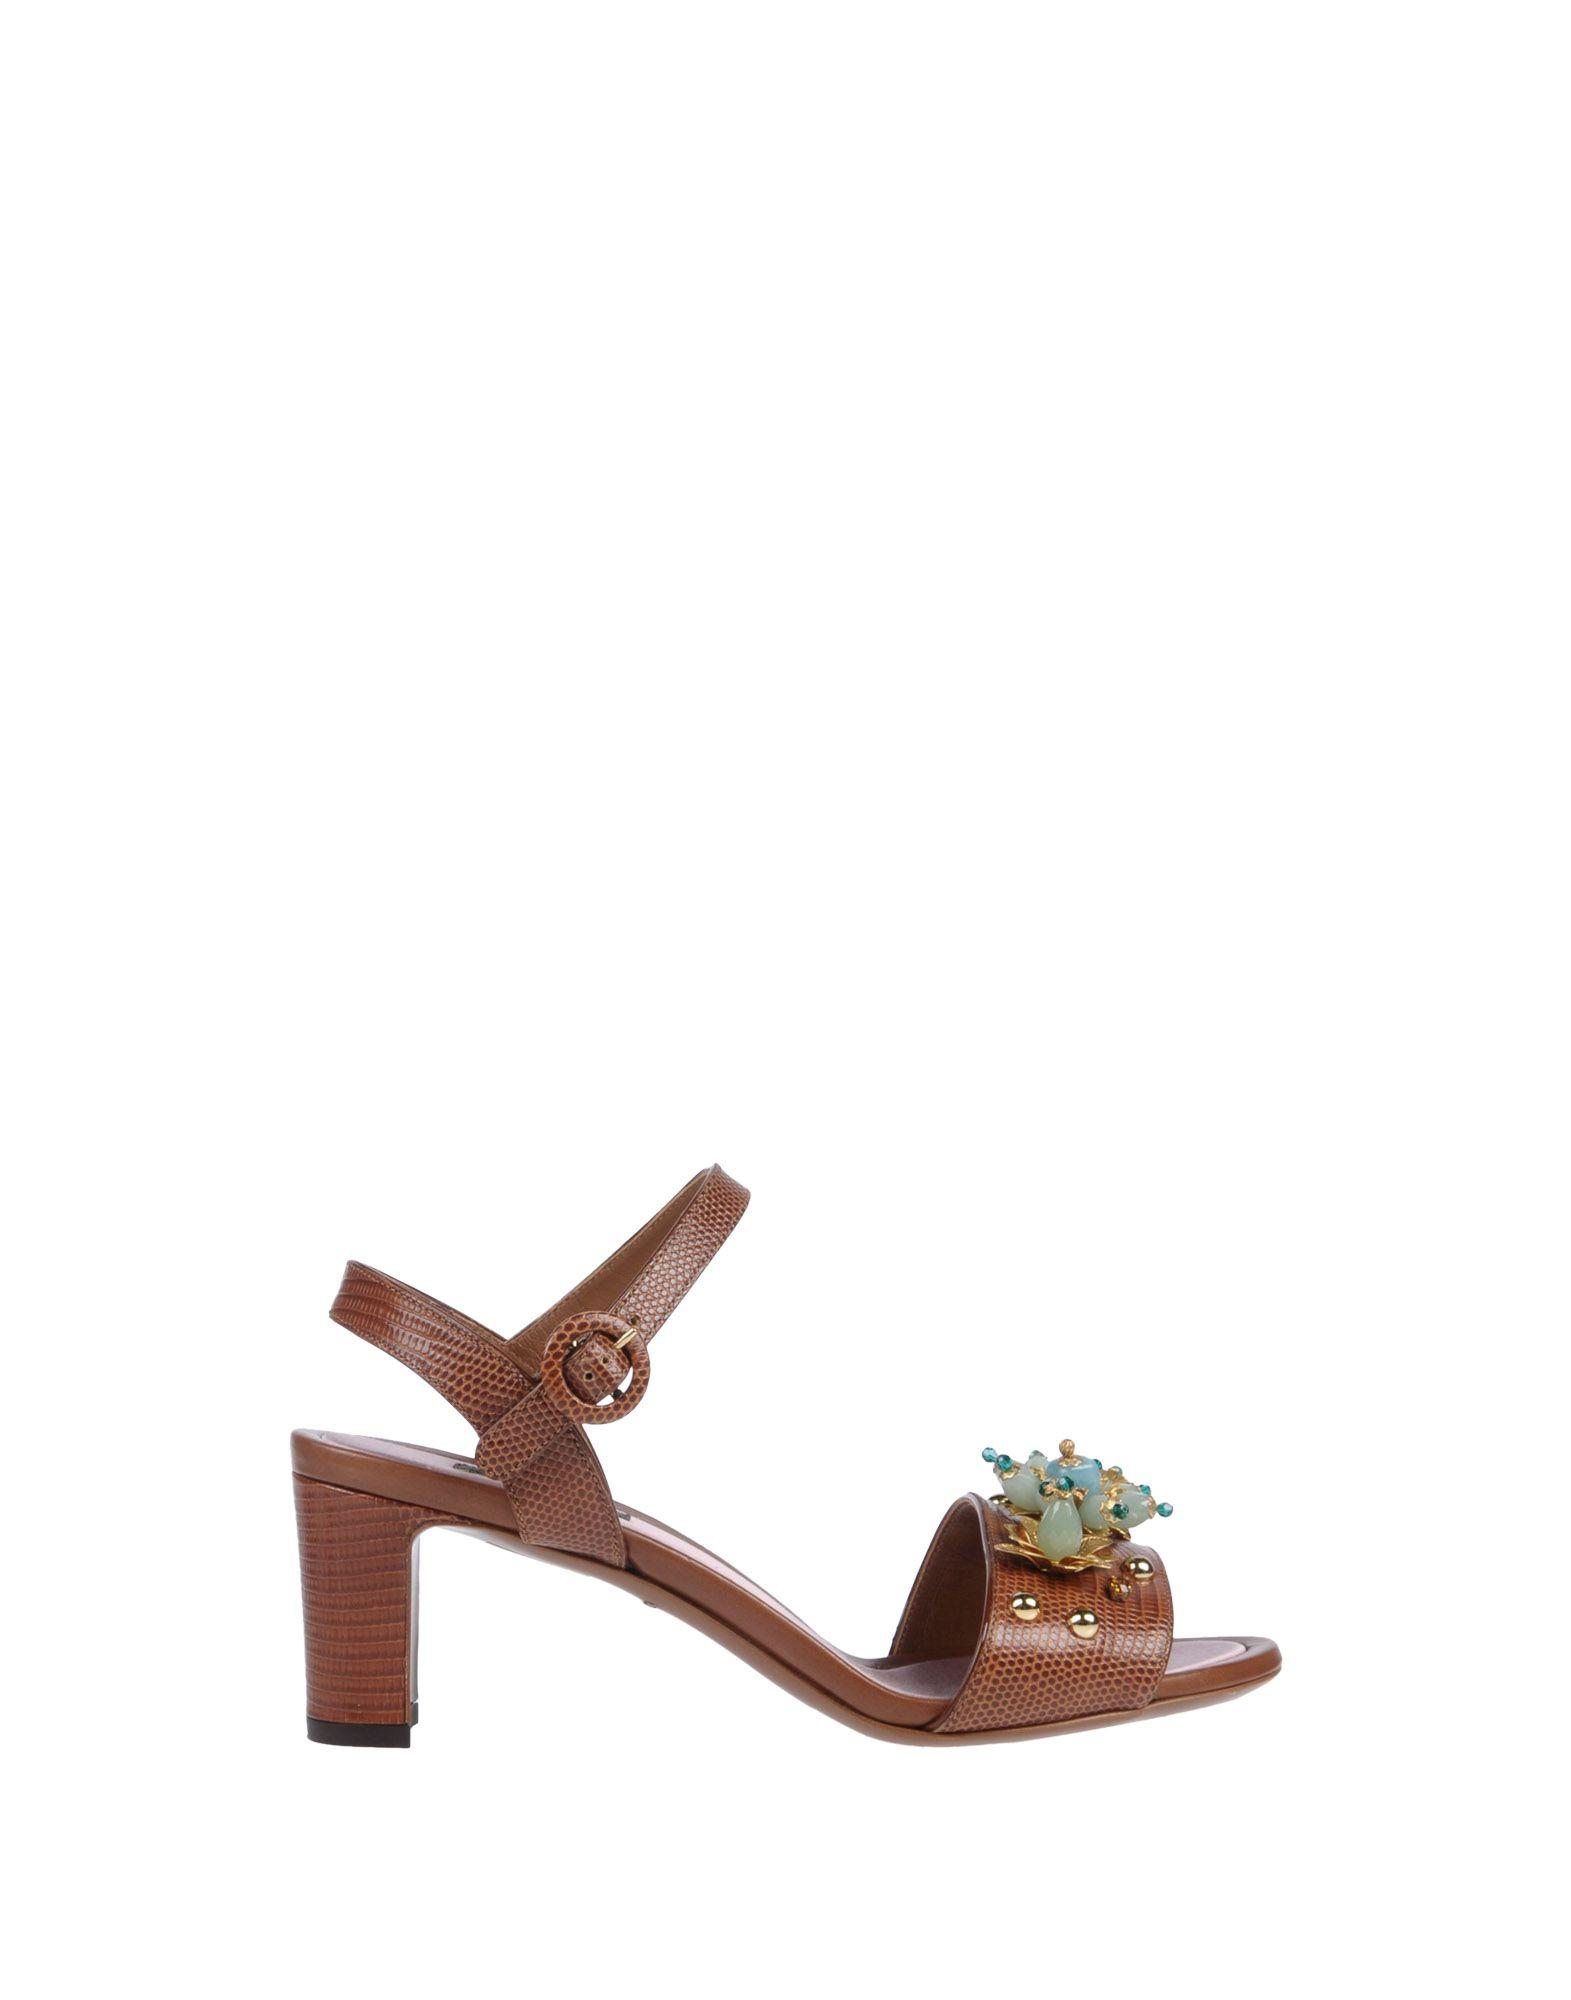 Dolce & Gabbana Sandalen Damen Damen Damen  11430676XN Neue Schuhe 49b812